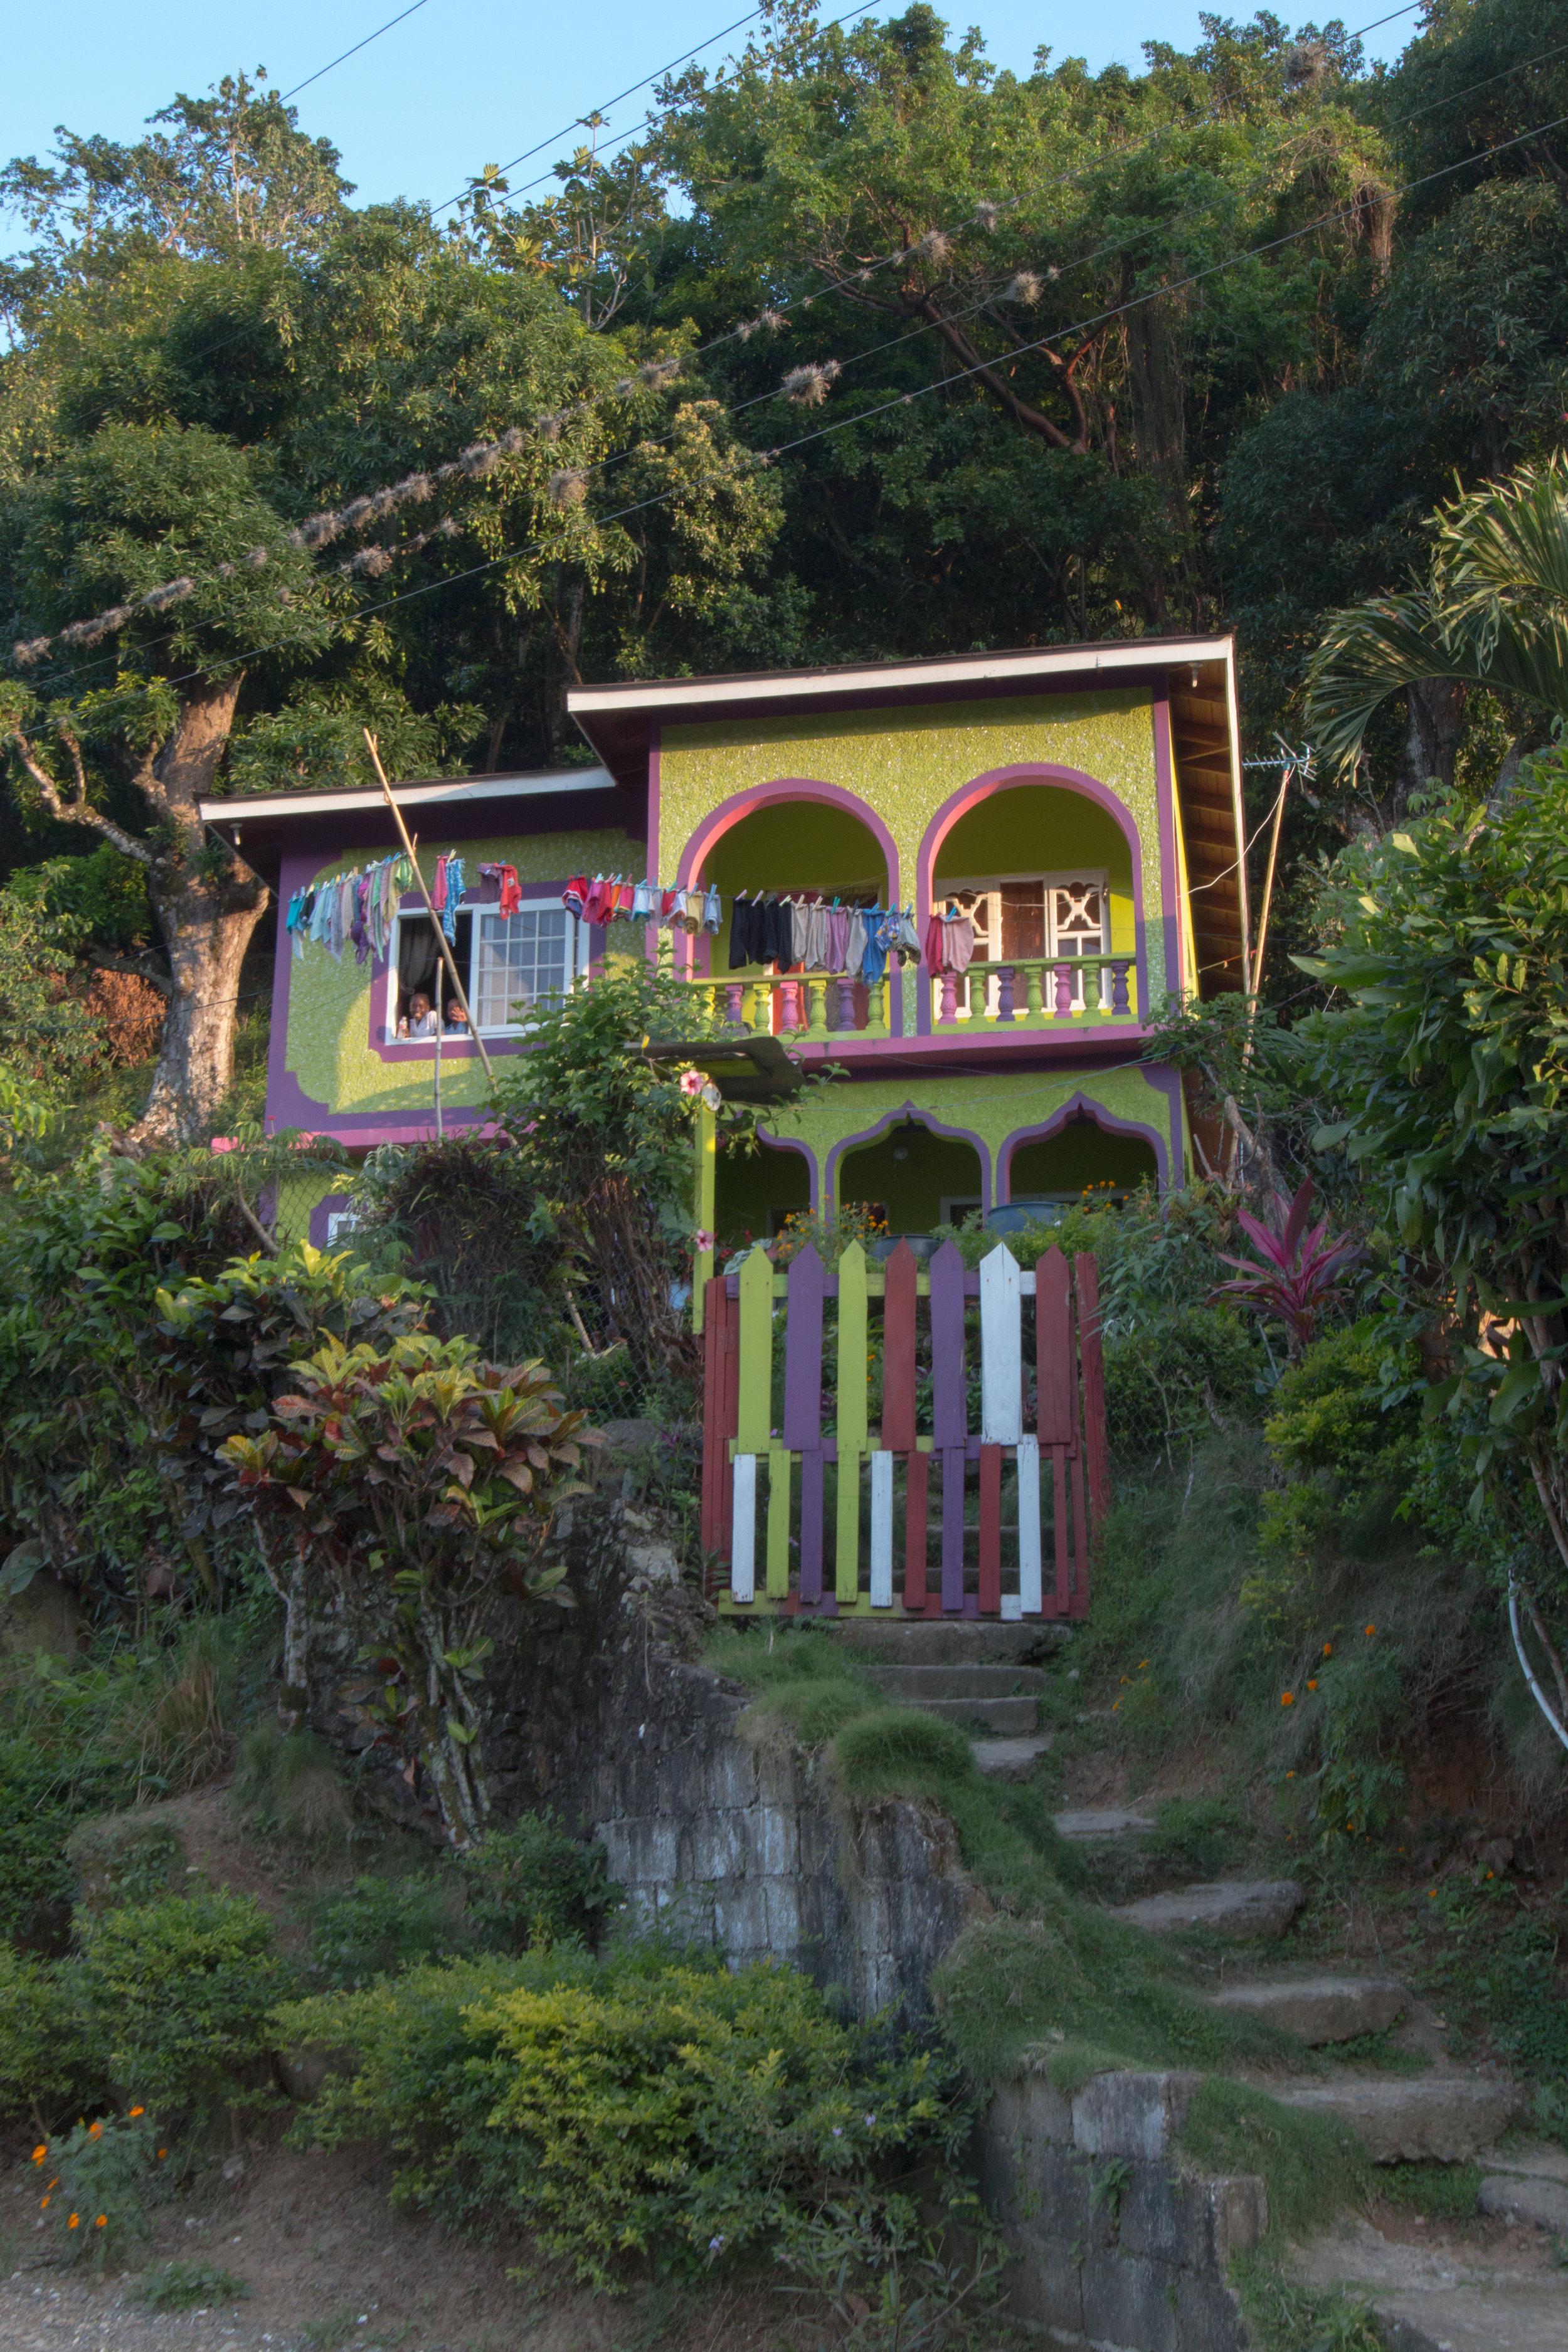 Jamaica edits for blog-39.jpg